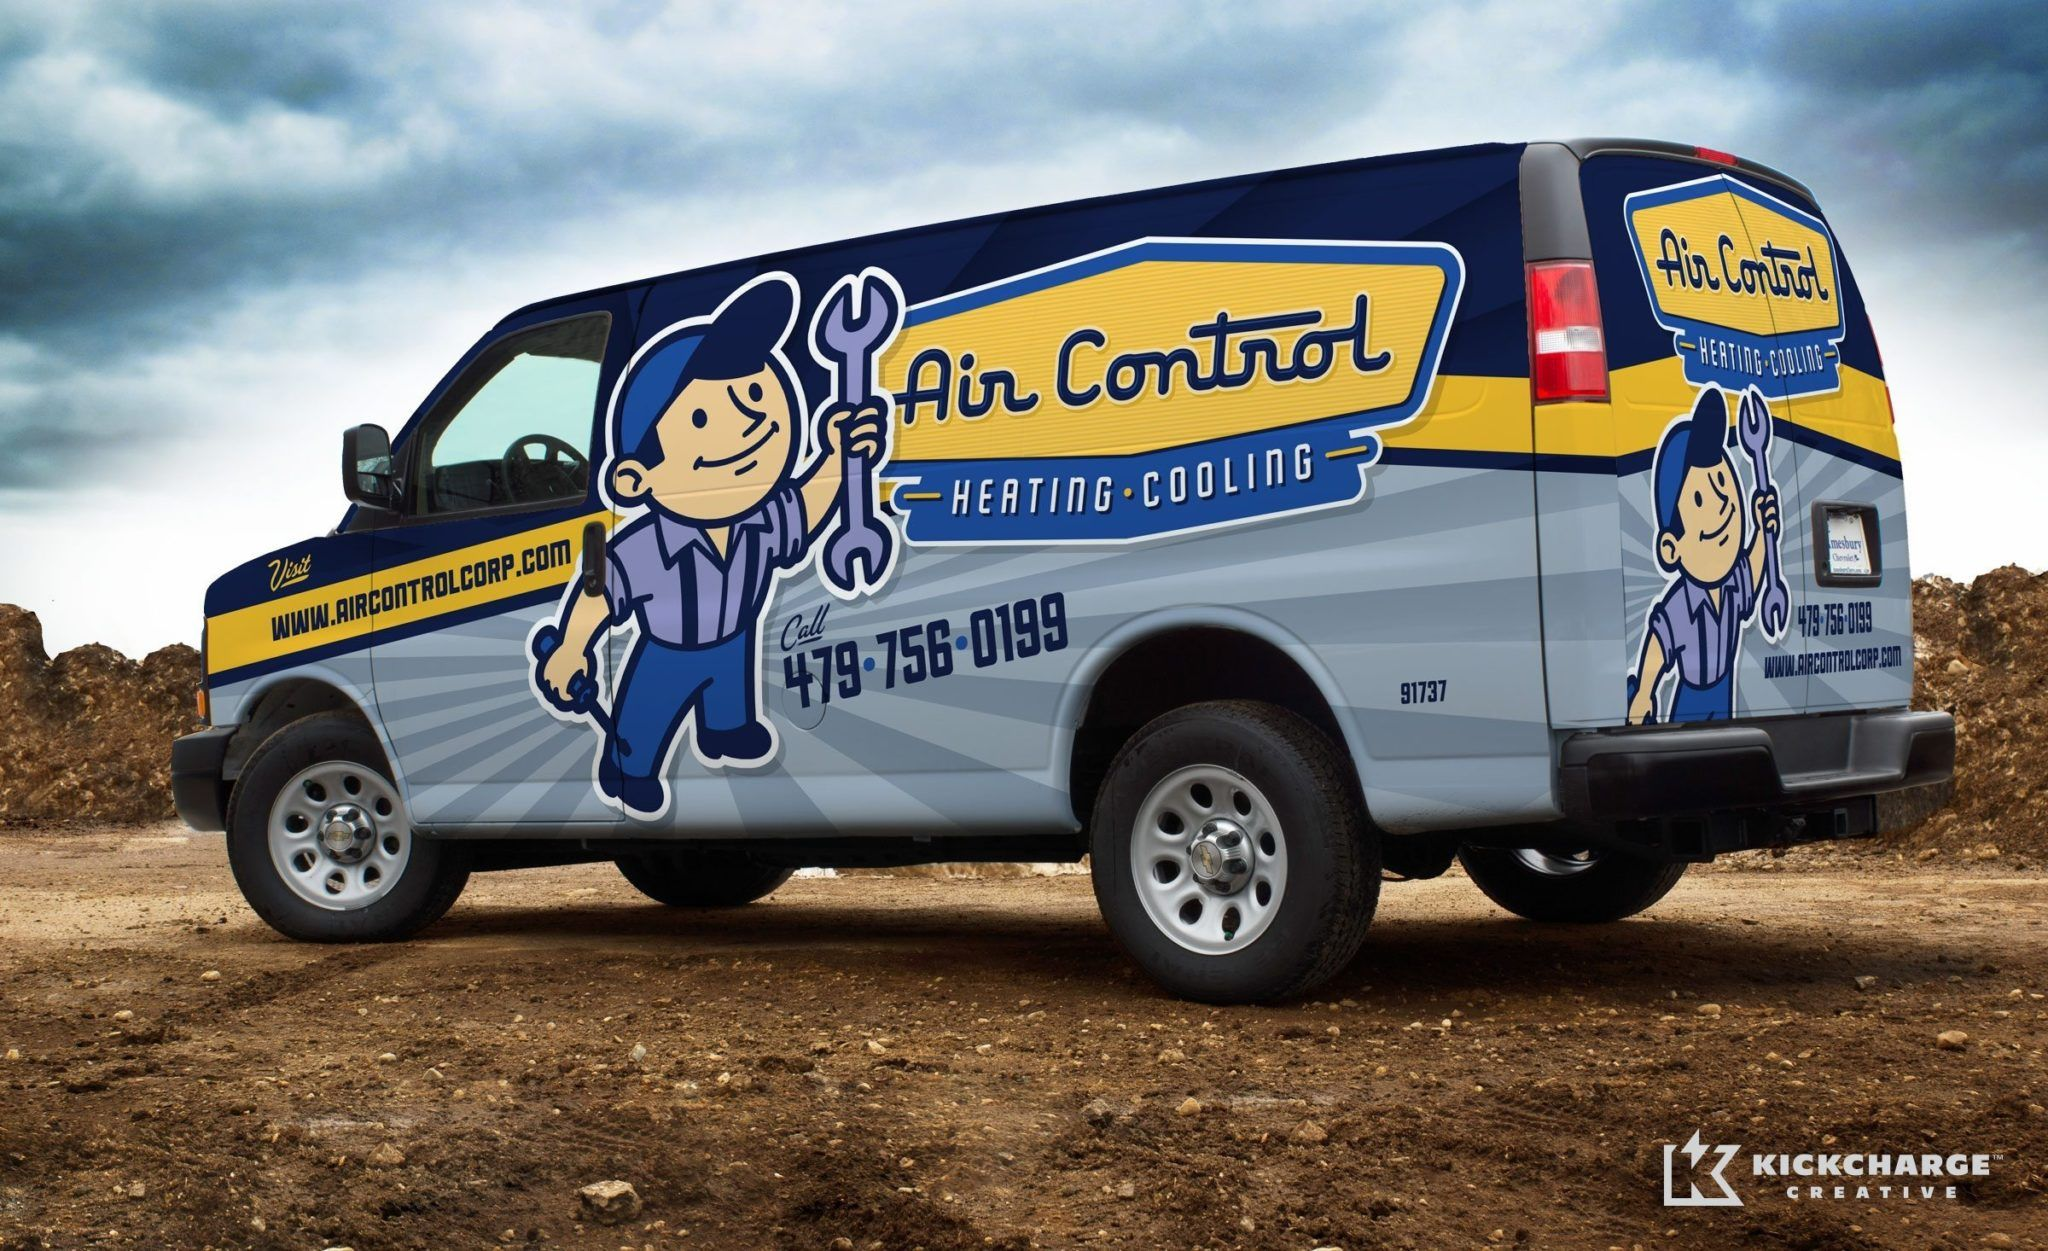 Best Truck Wraps And Fleet Branding From Kickcharge Creative Reklama